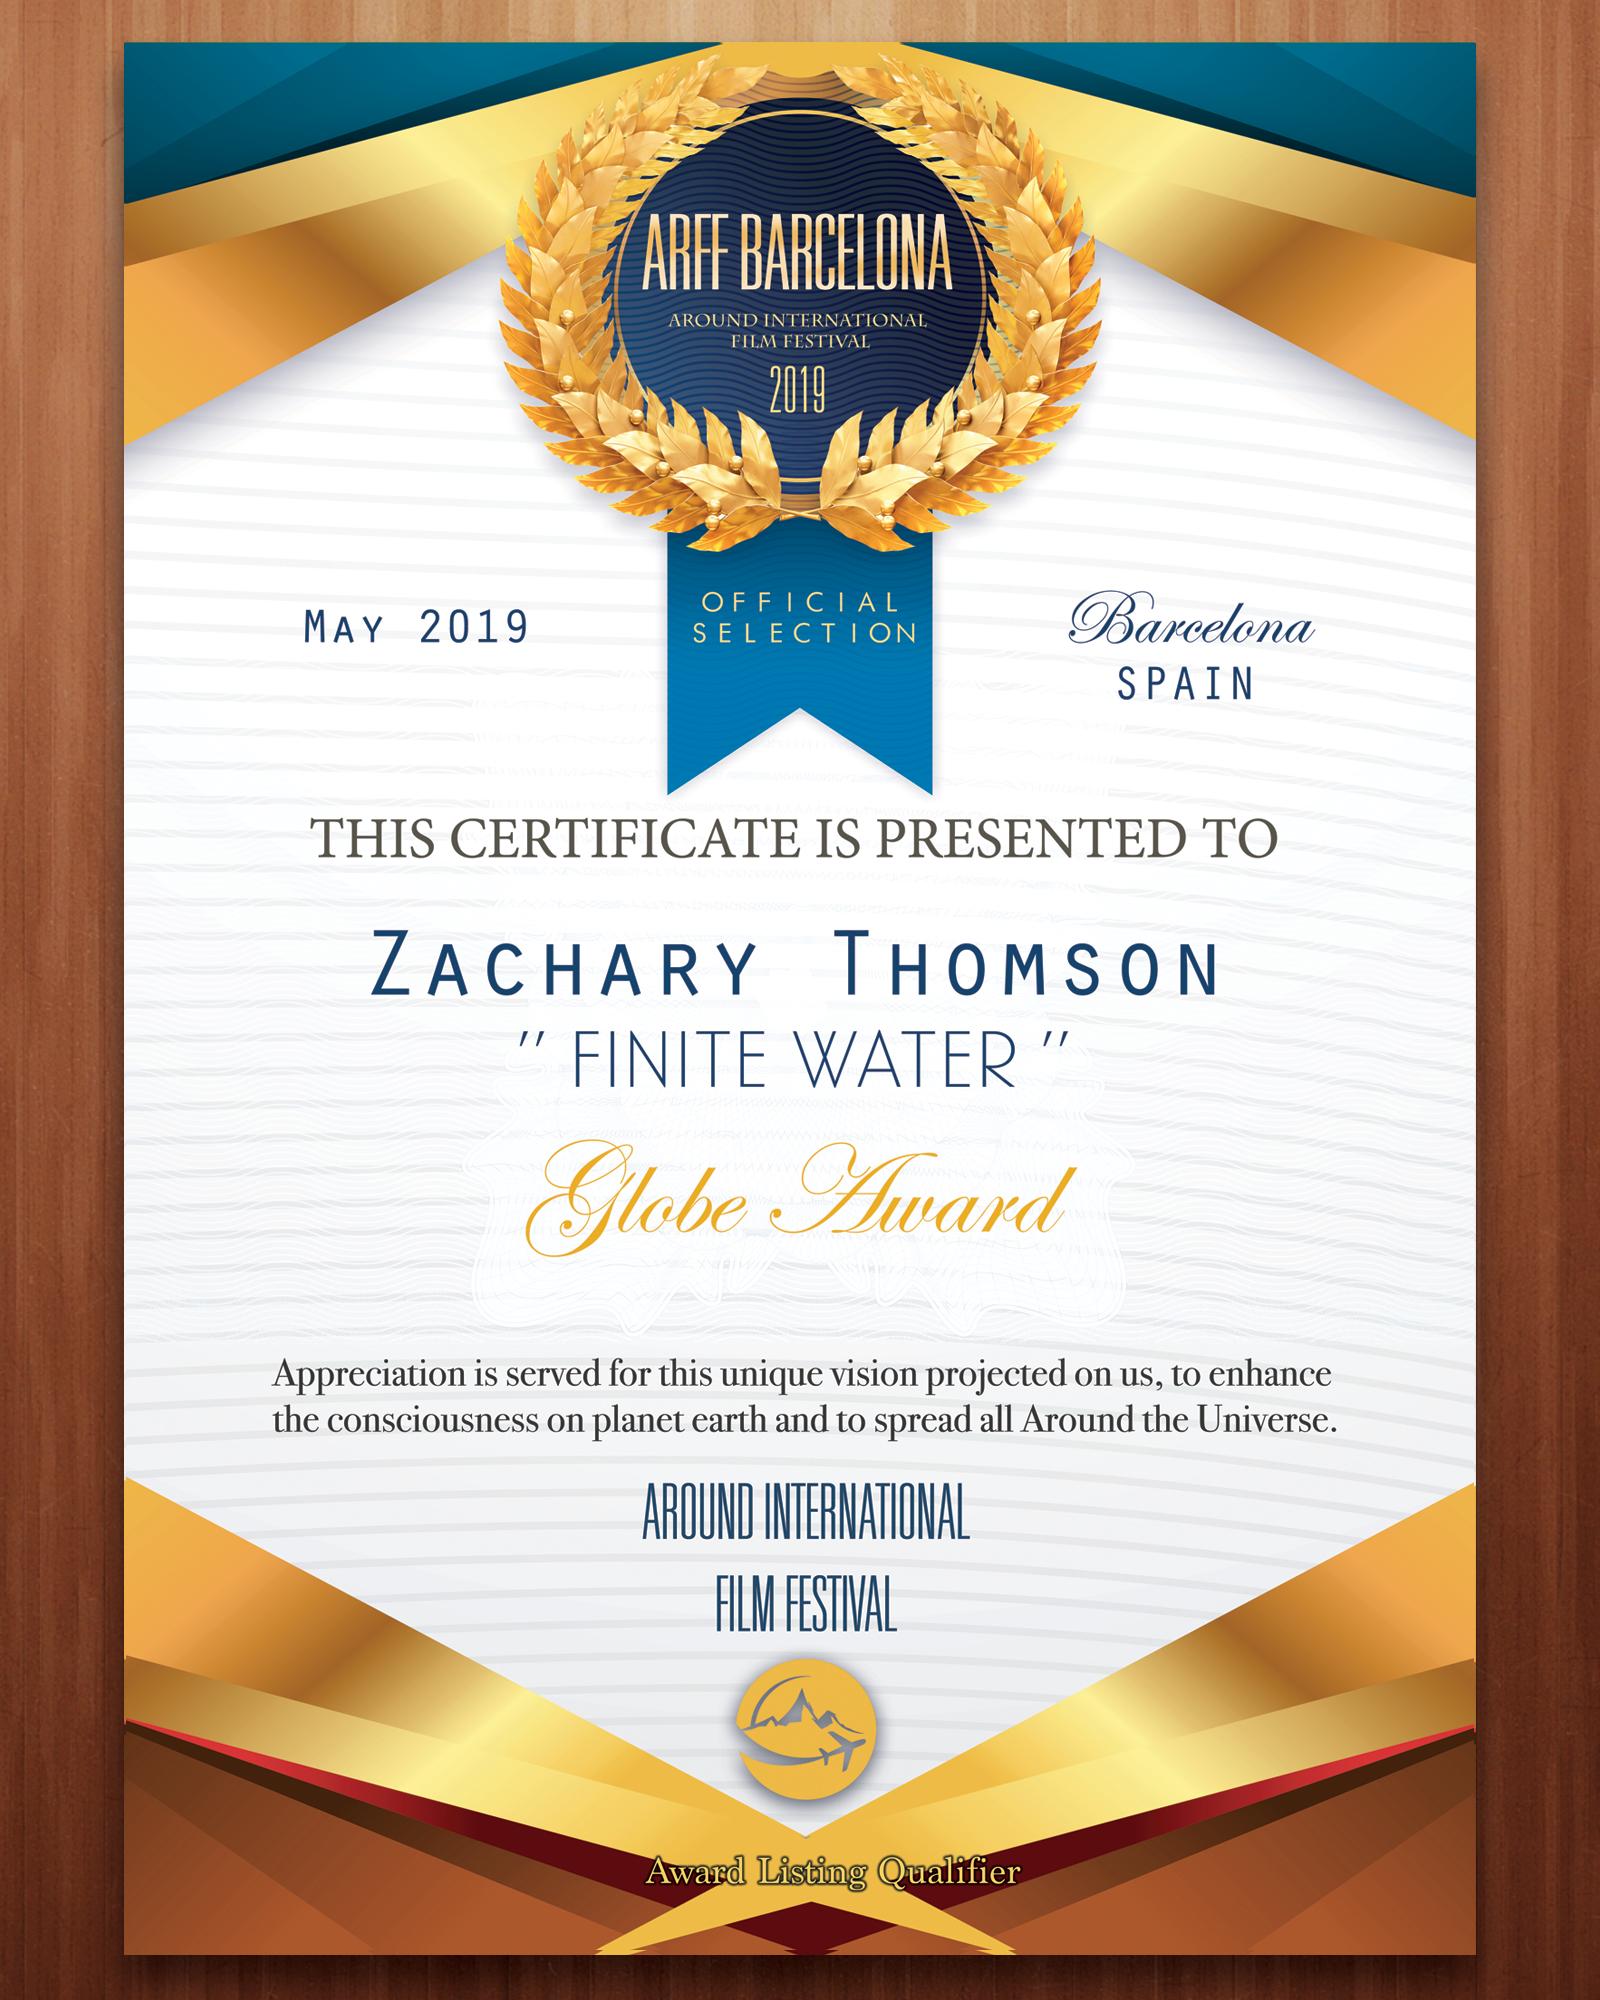 ARFF_Certificate_Finite_Water_Zachary Thomson_2019.png